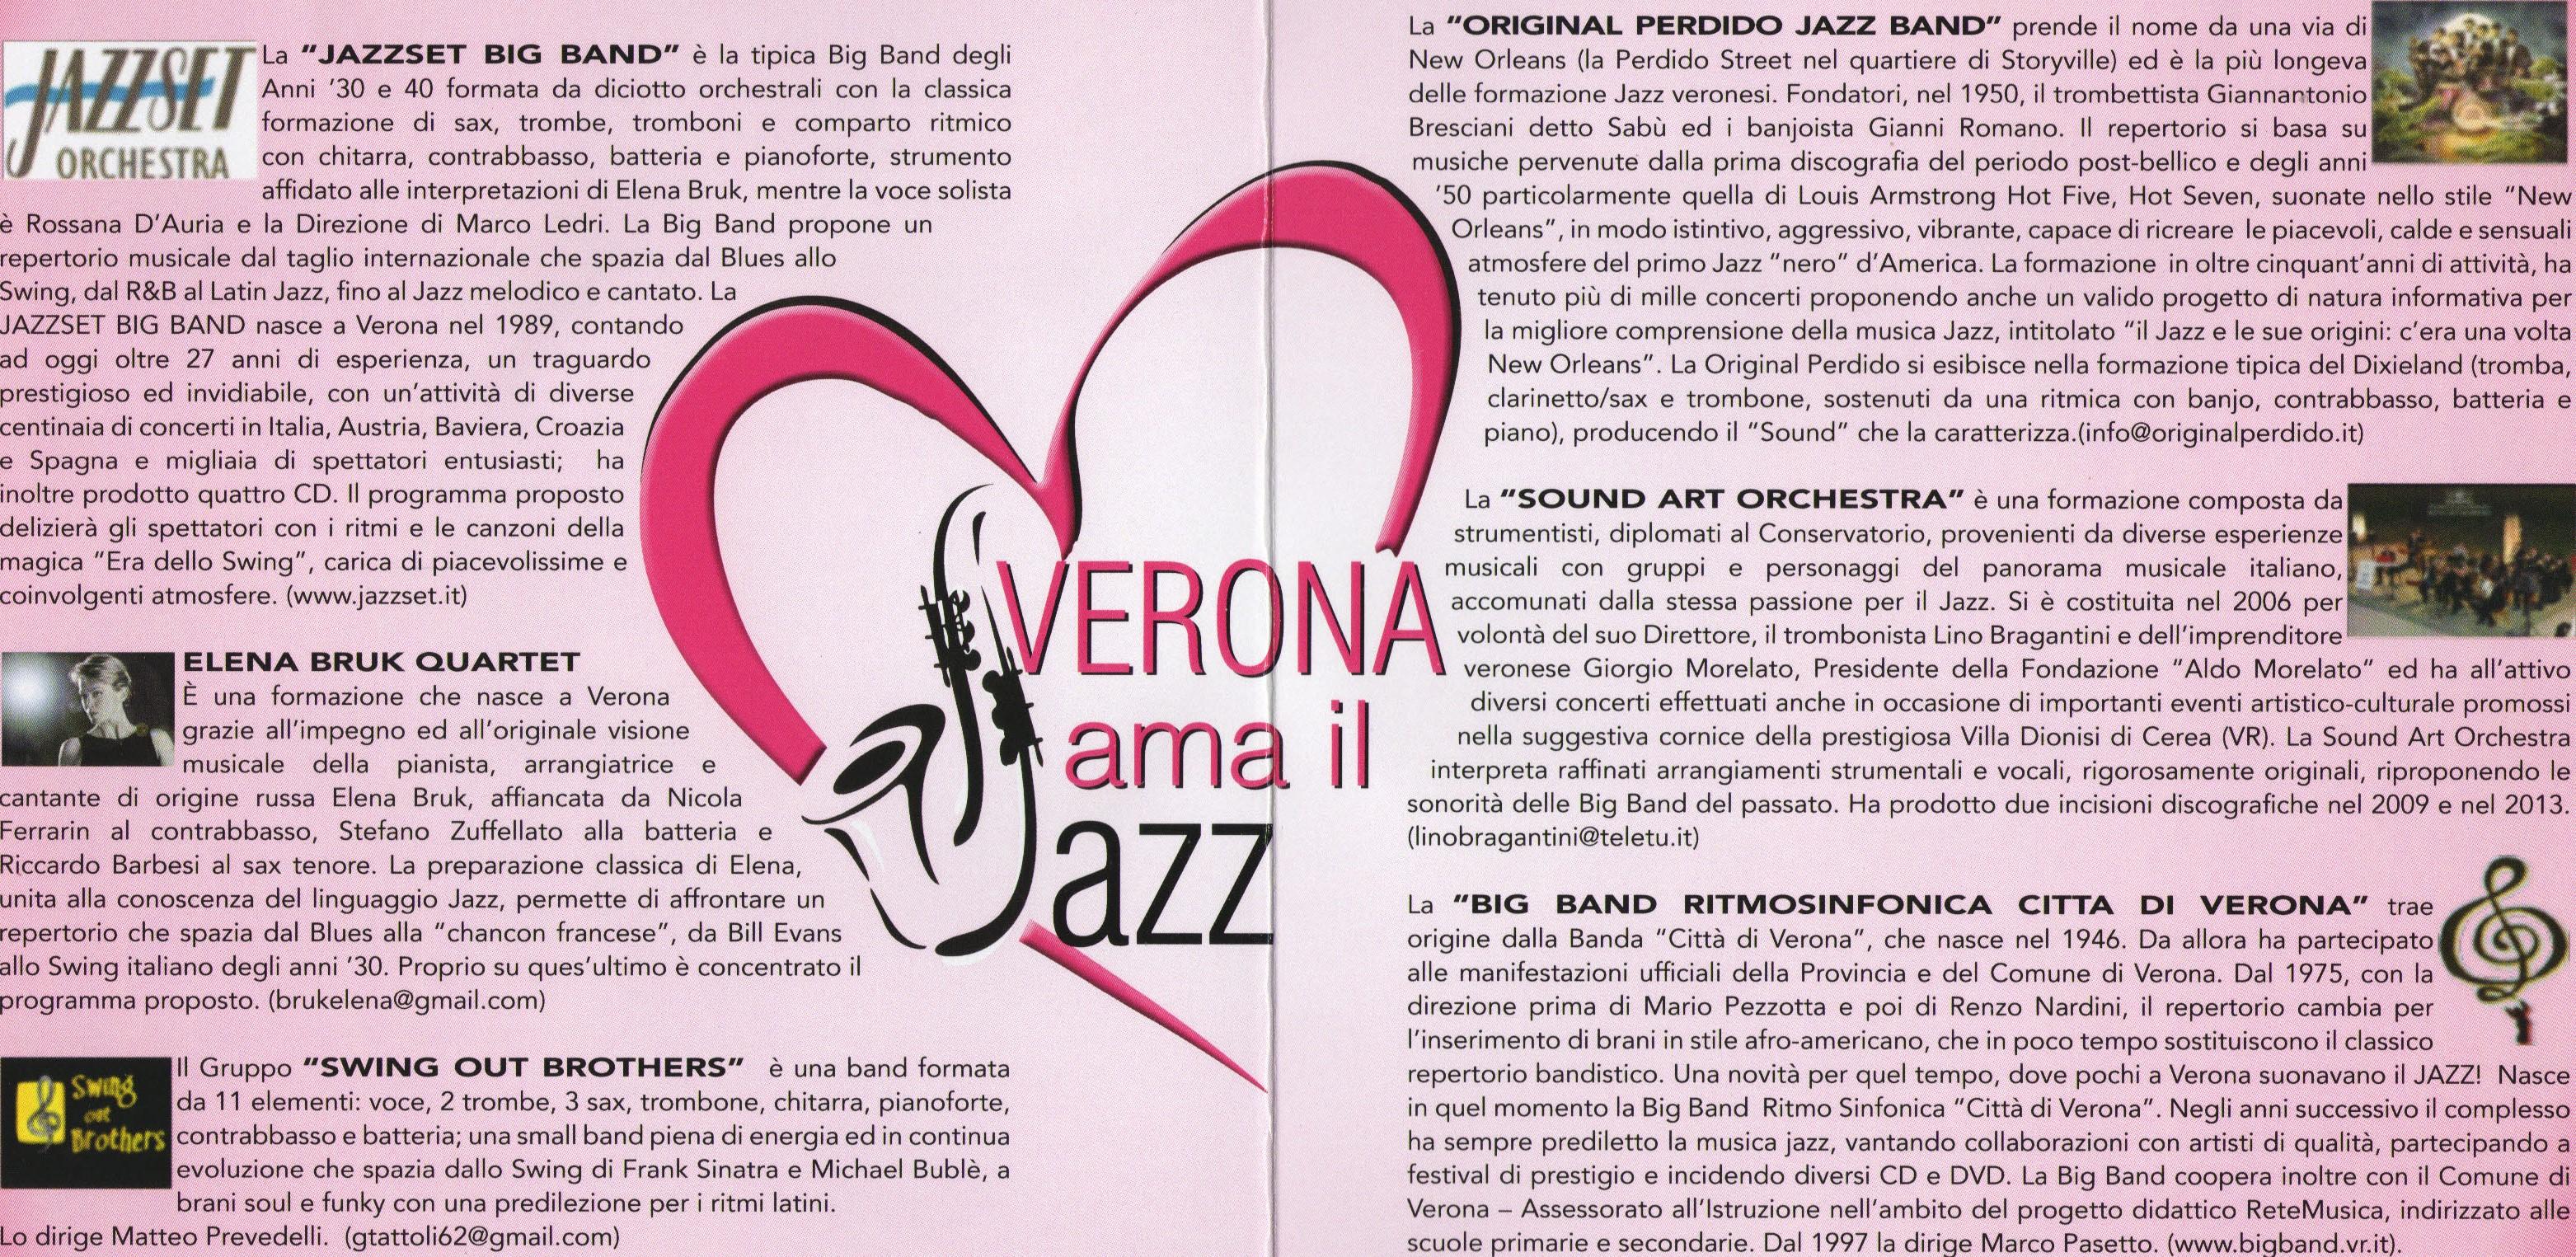 Verona ama il jazz 2